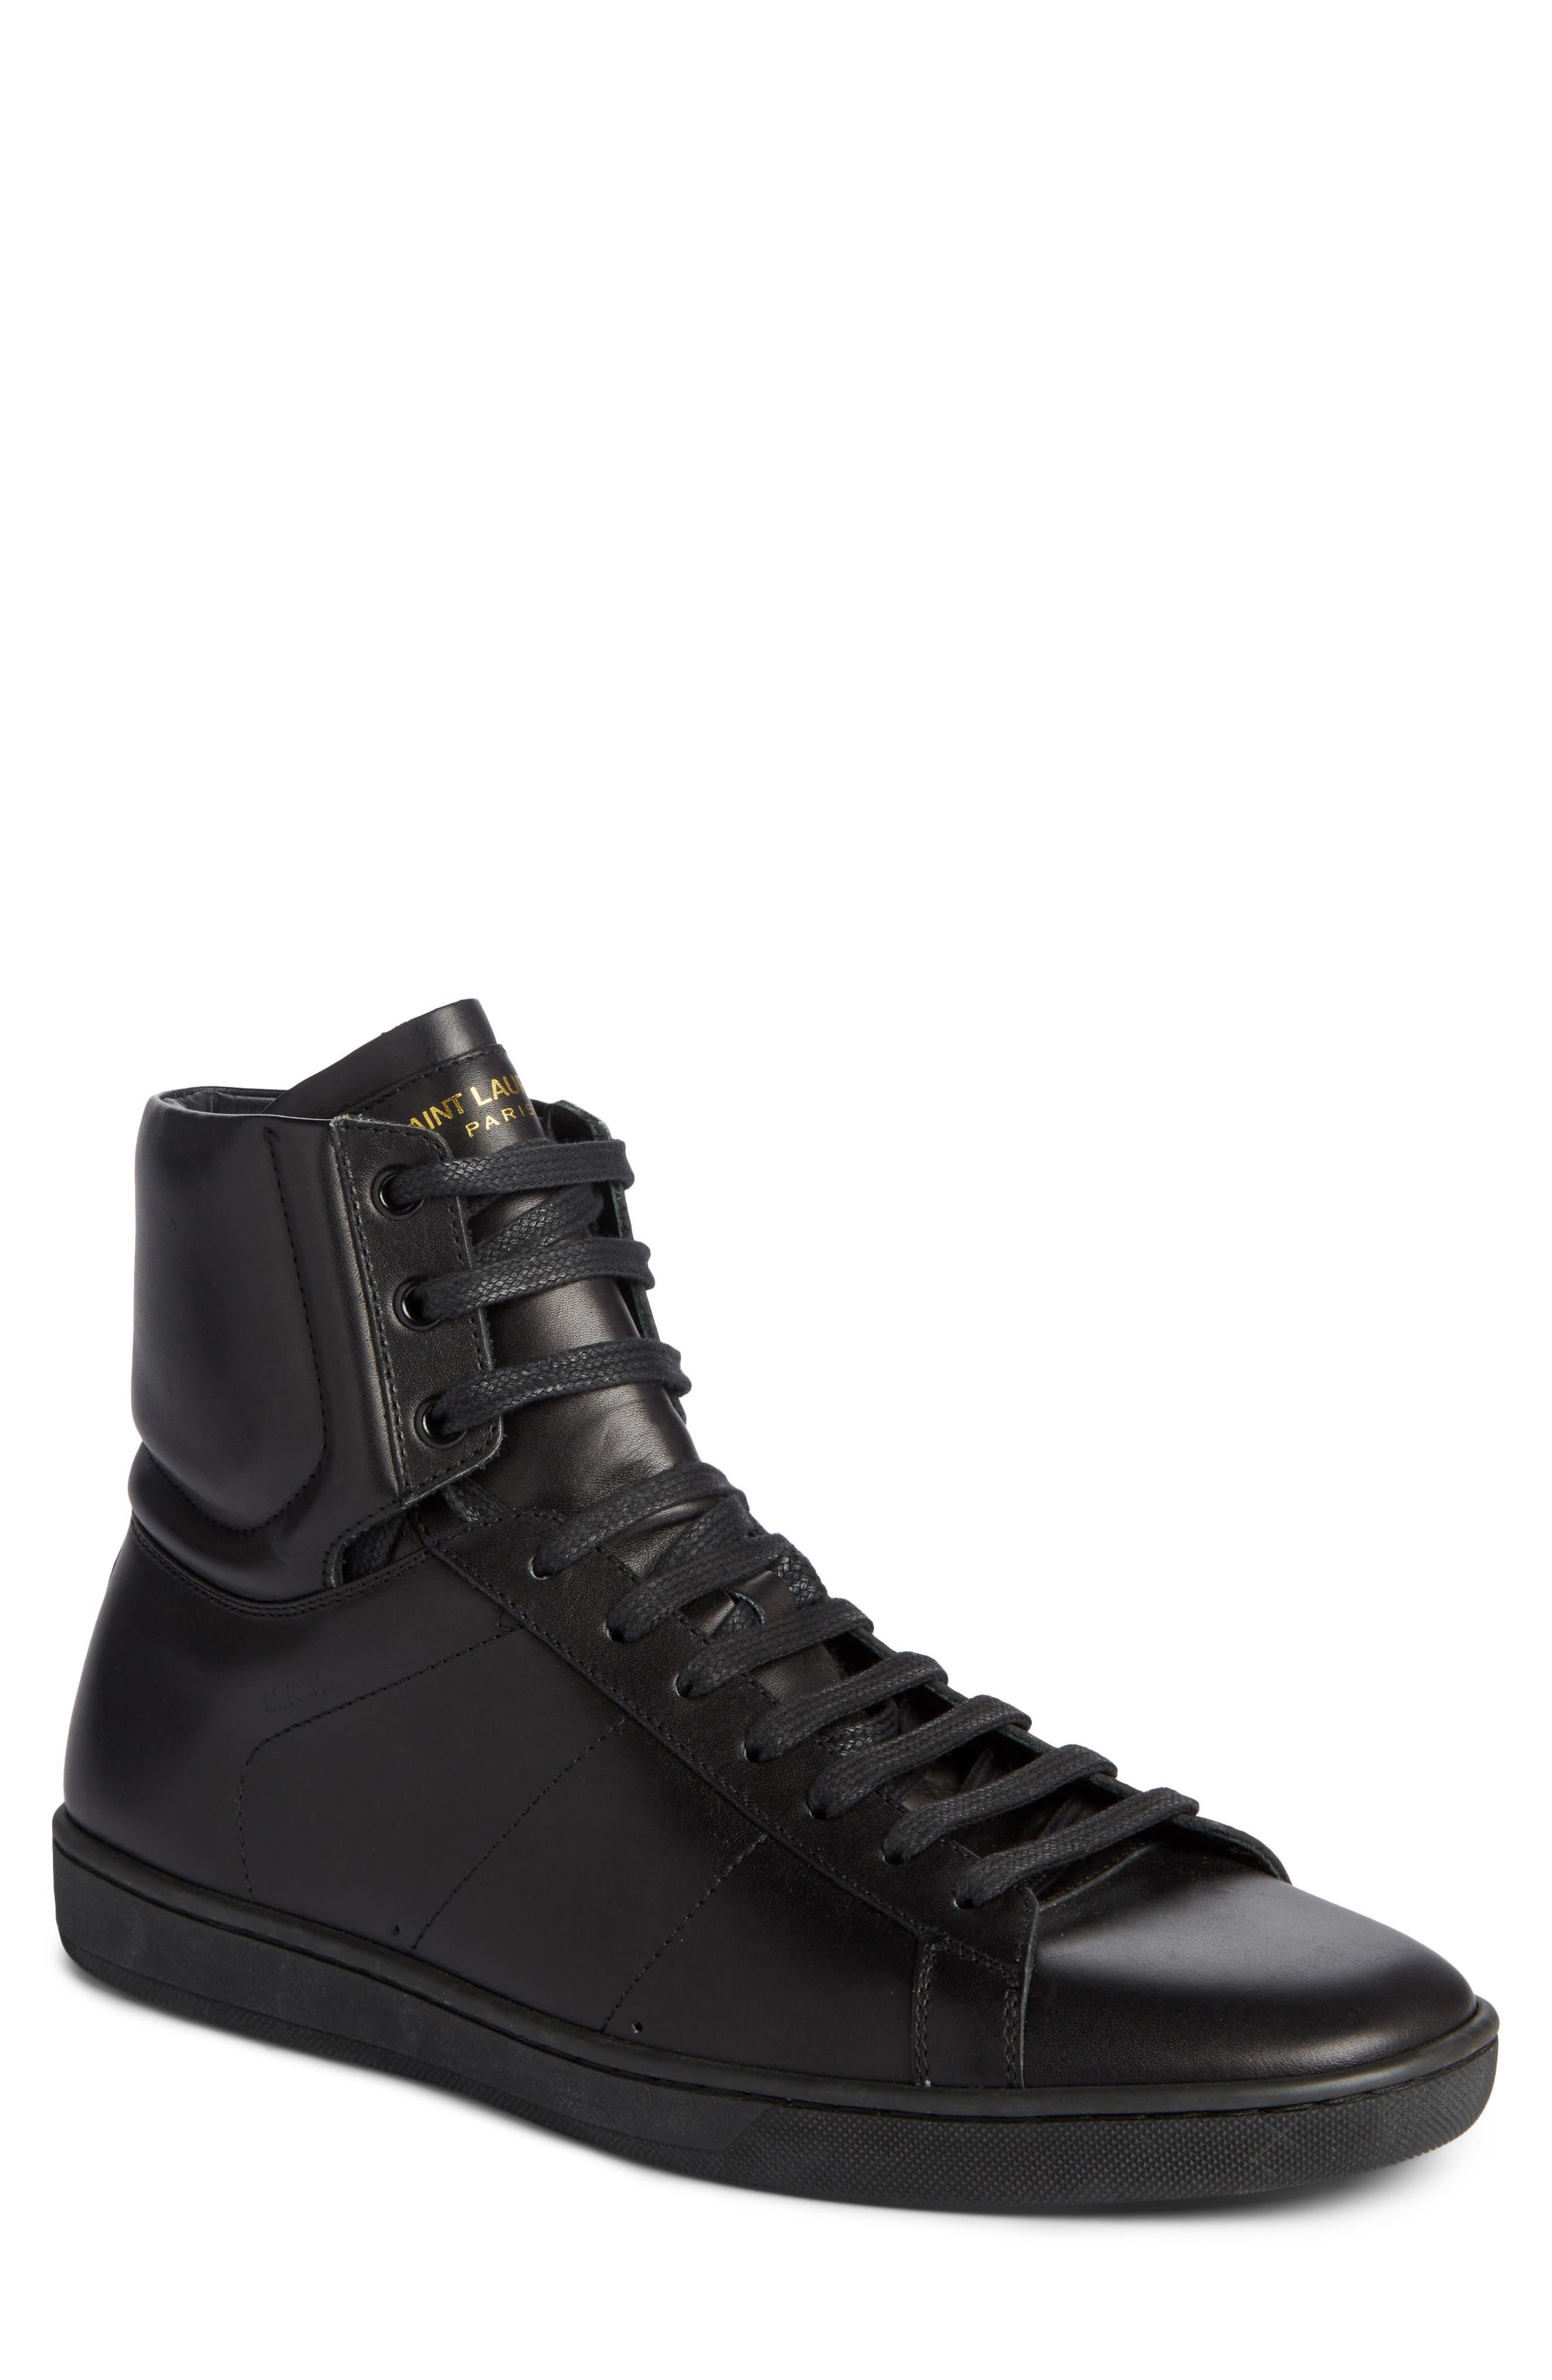 Signature Court Classic Sneaker,                             Main thumbnail 1, color,                             001